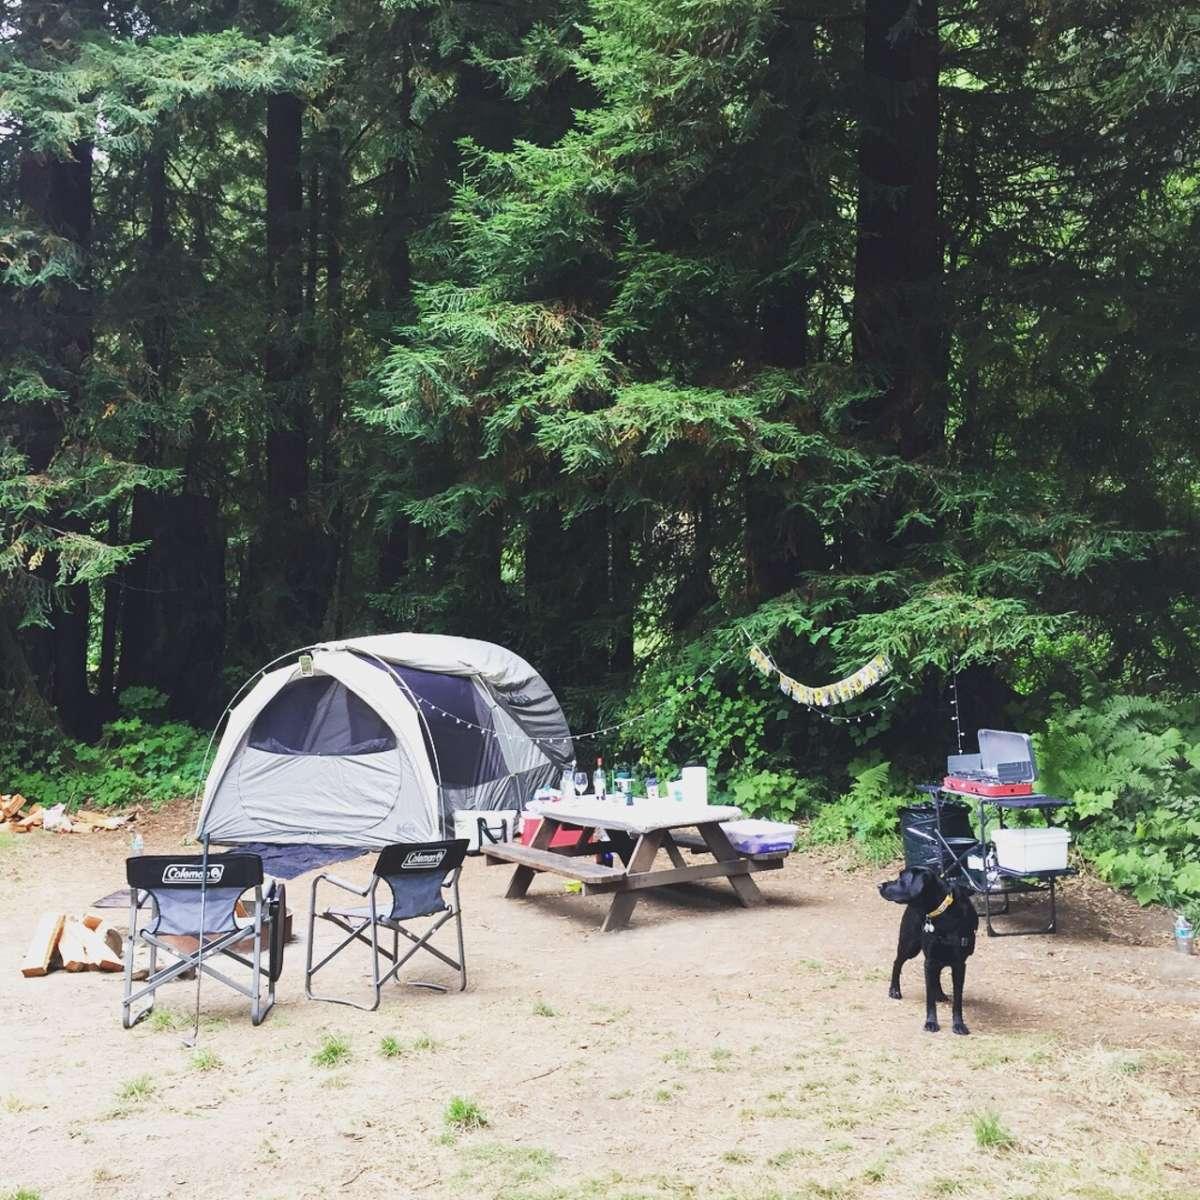 Camp Creek Apartments: Creekside Camp, Salmon Creek Ranch, CA: 174 Hipcamper